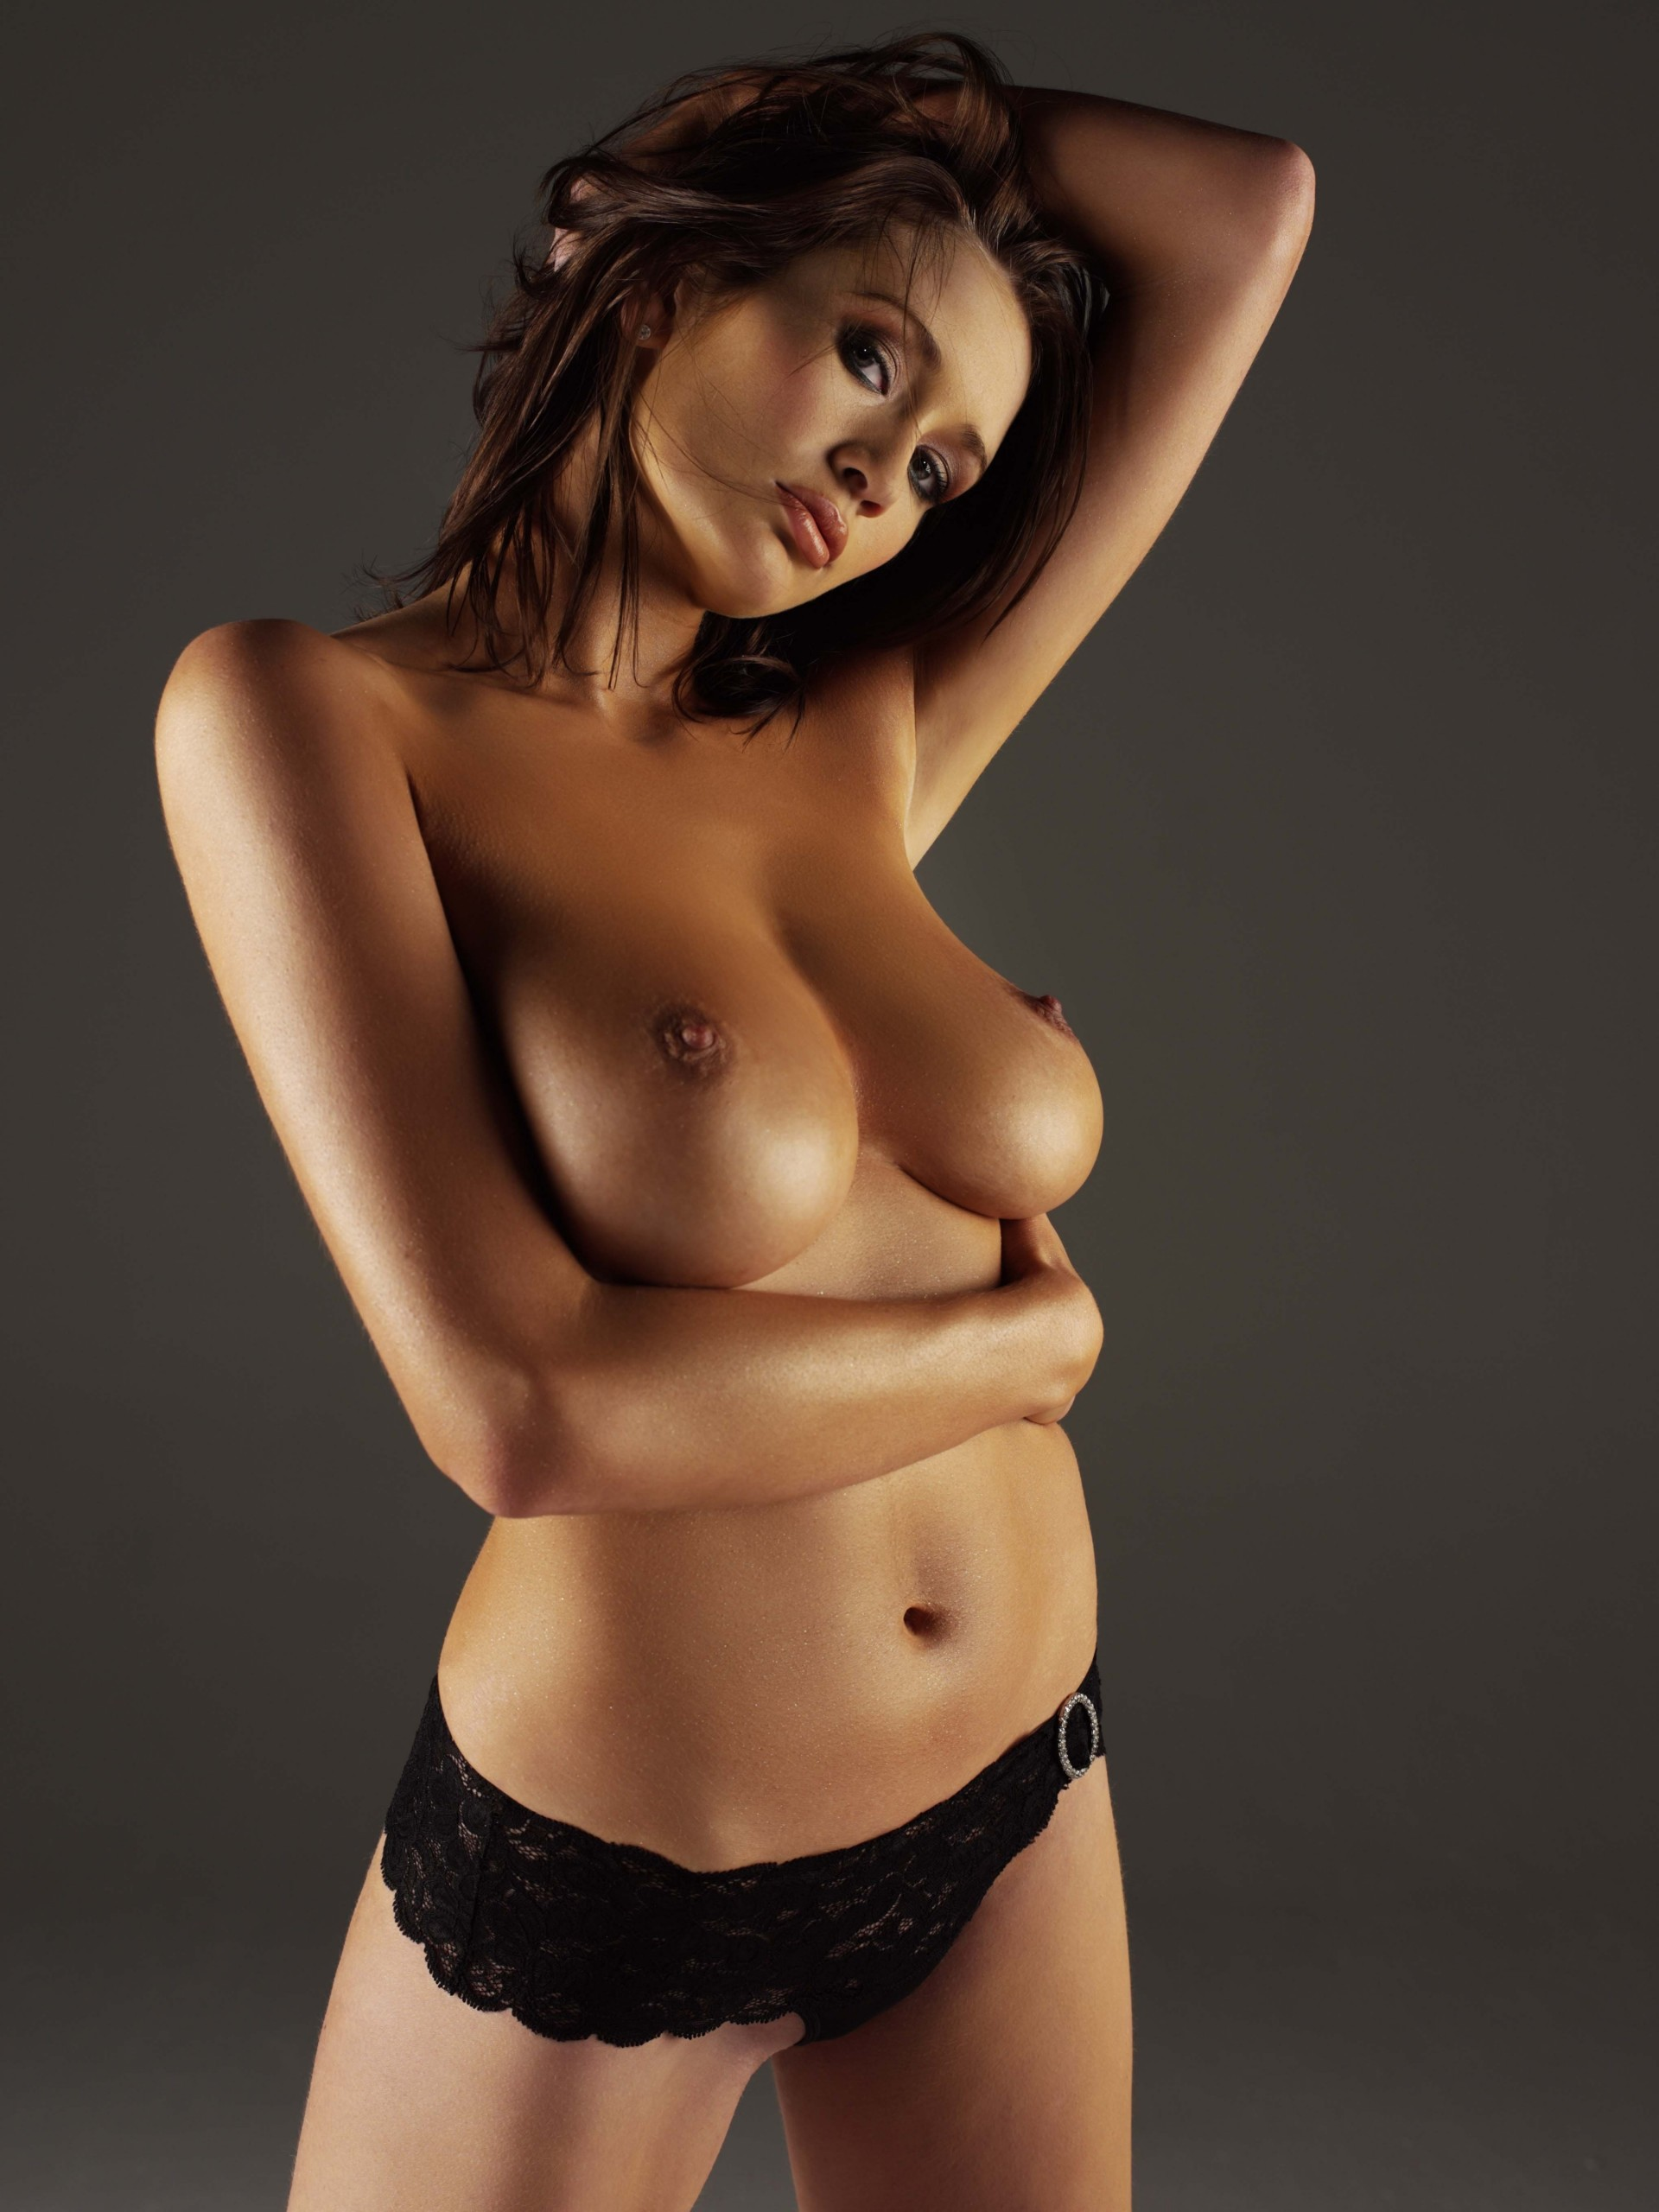 sexy-woman-three-breasts-naked-olivia-wilde-having-sex